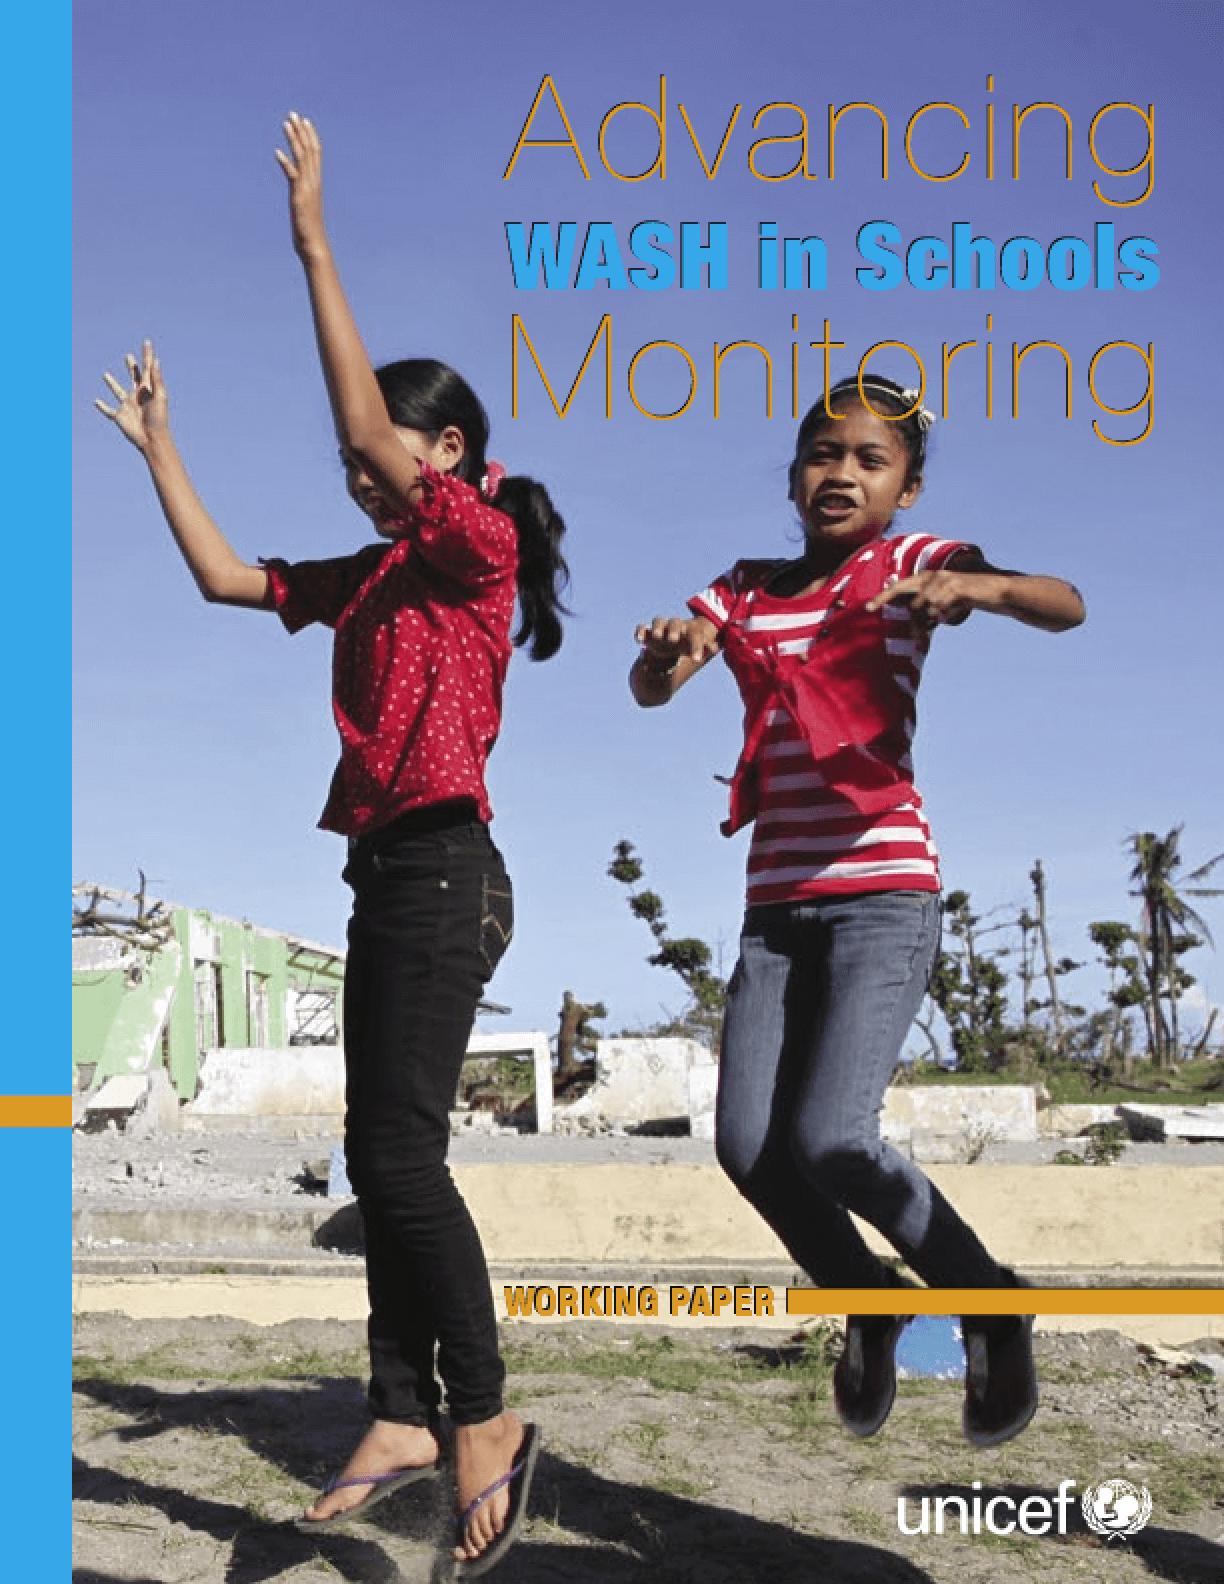 Advancing WASH in Schools Monitoring